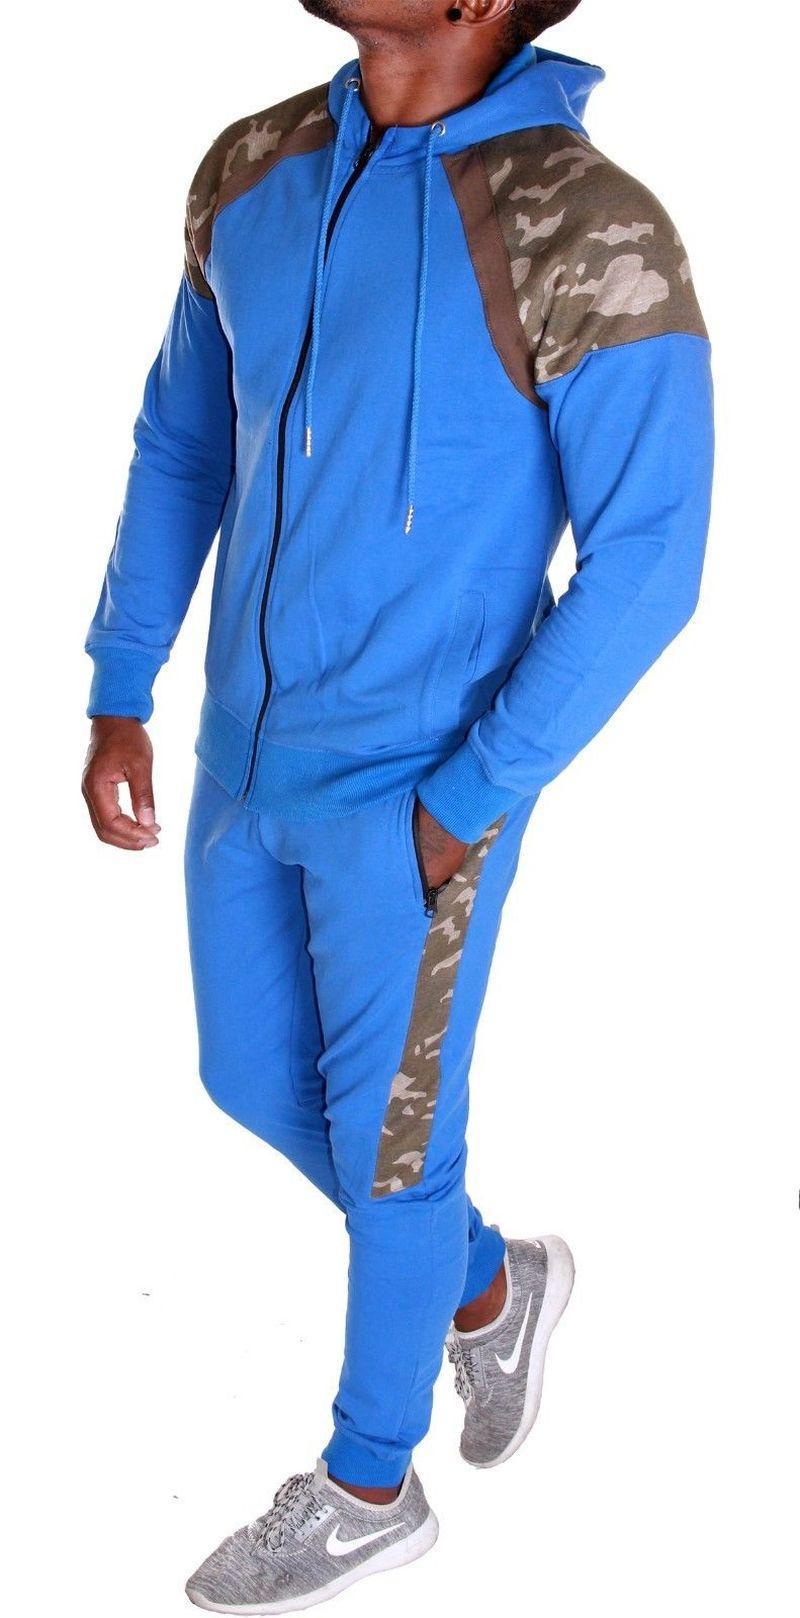 Zogaa Hot Sale 2019 Tracksuit Men Casual Long Sleeve Sweatsuit Men Patchwork 2 Piece Of Sets Jogger Suits For Men